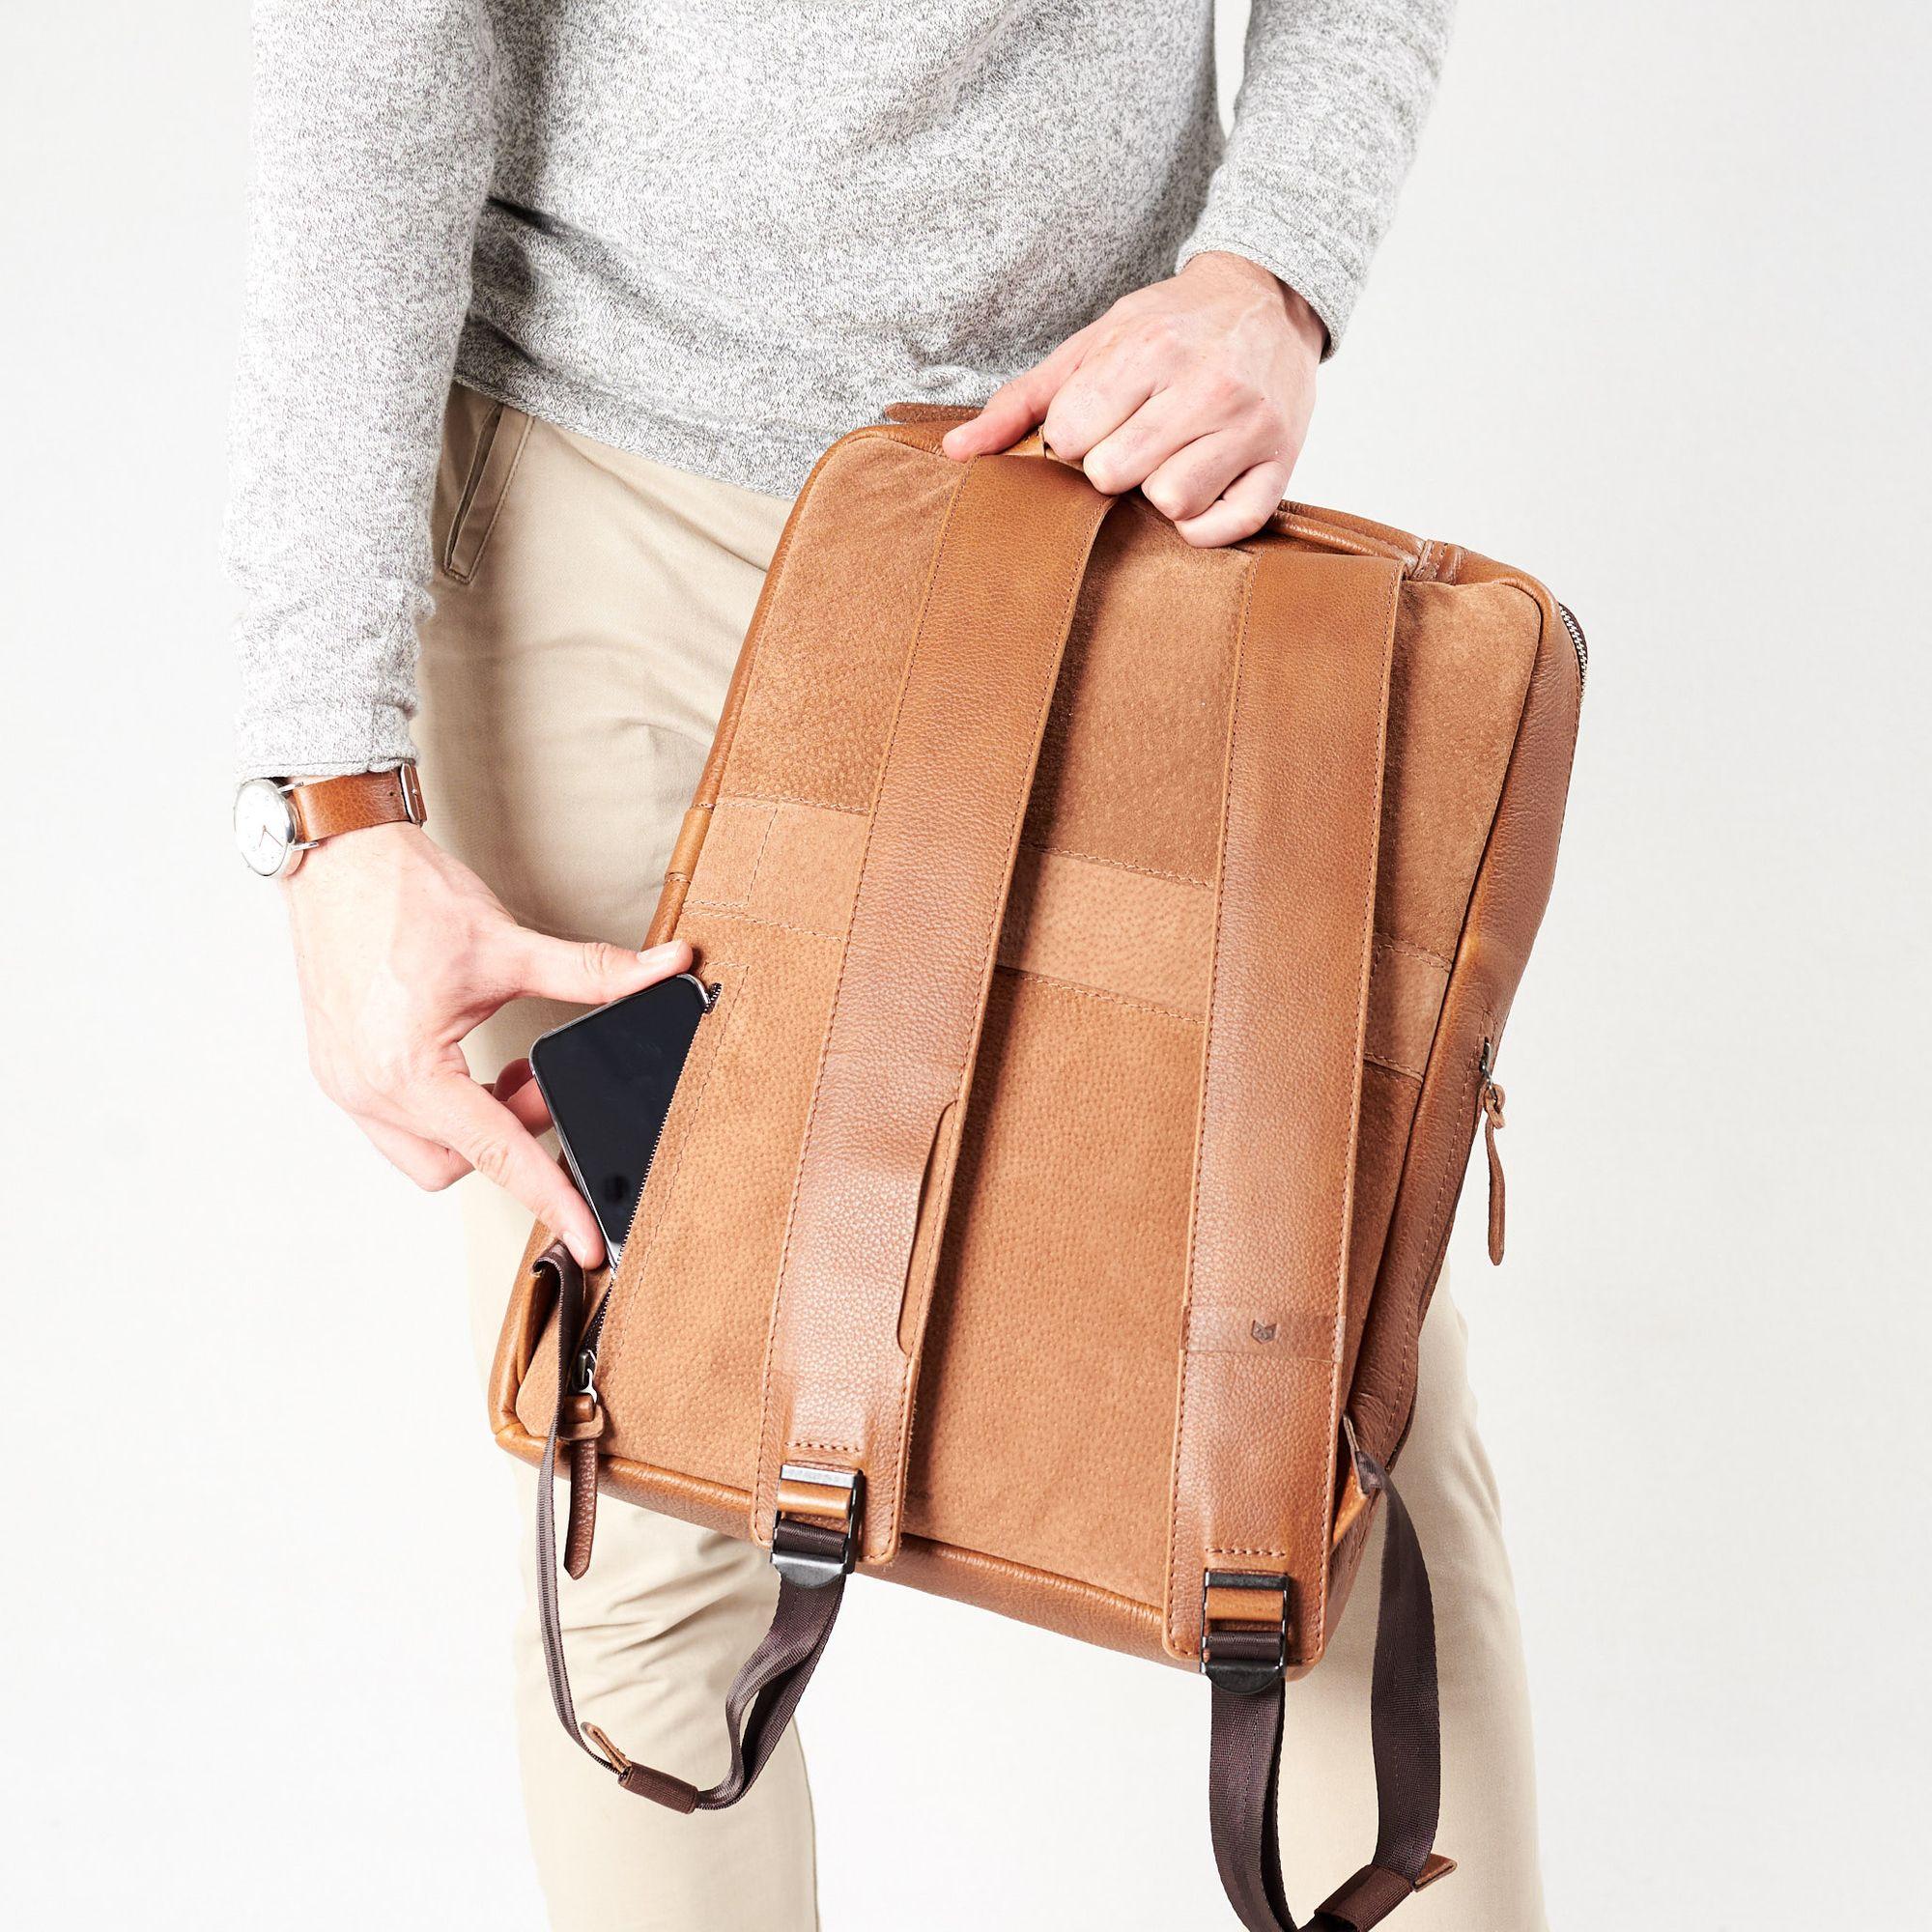 WeoHau Fashion Buckle Ladies Pu Wallet Purse Simple Long Multi-Function Clutch Bag Purse